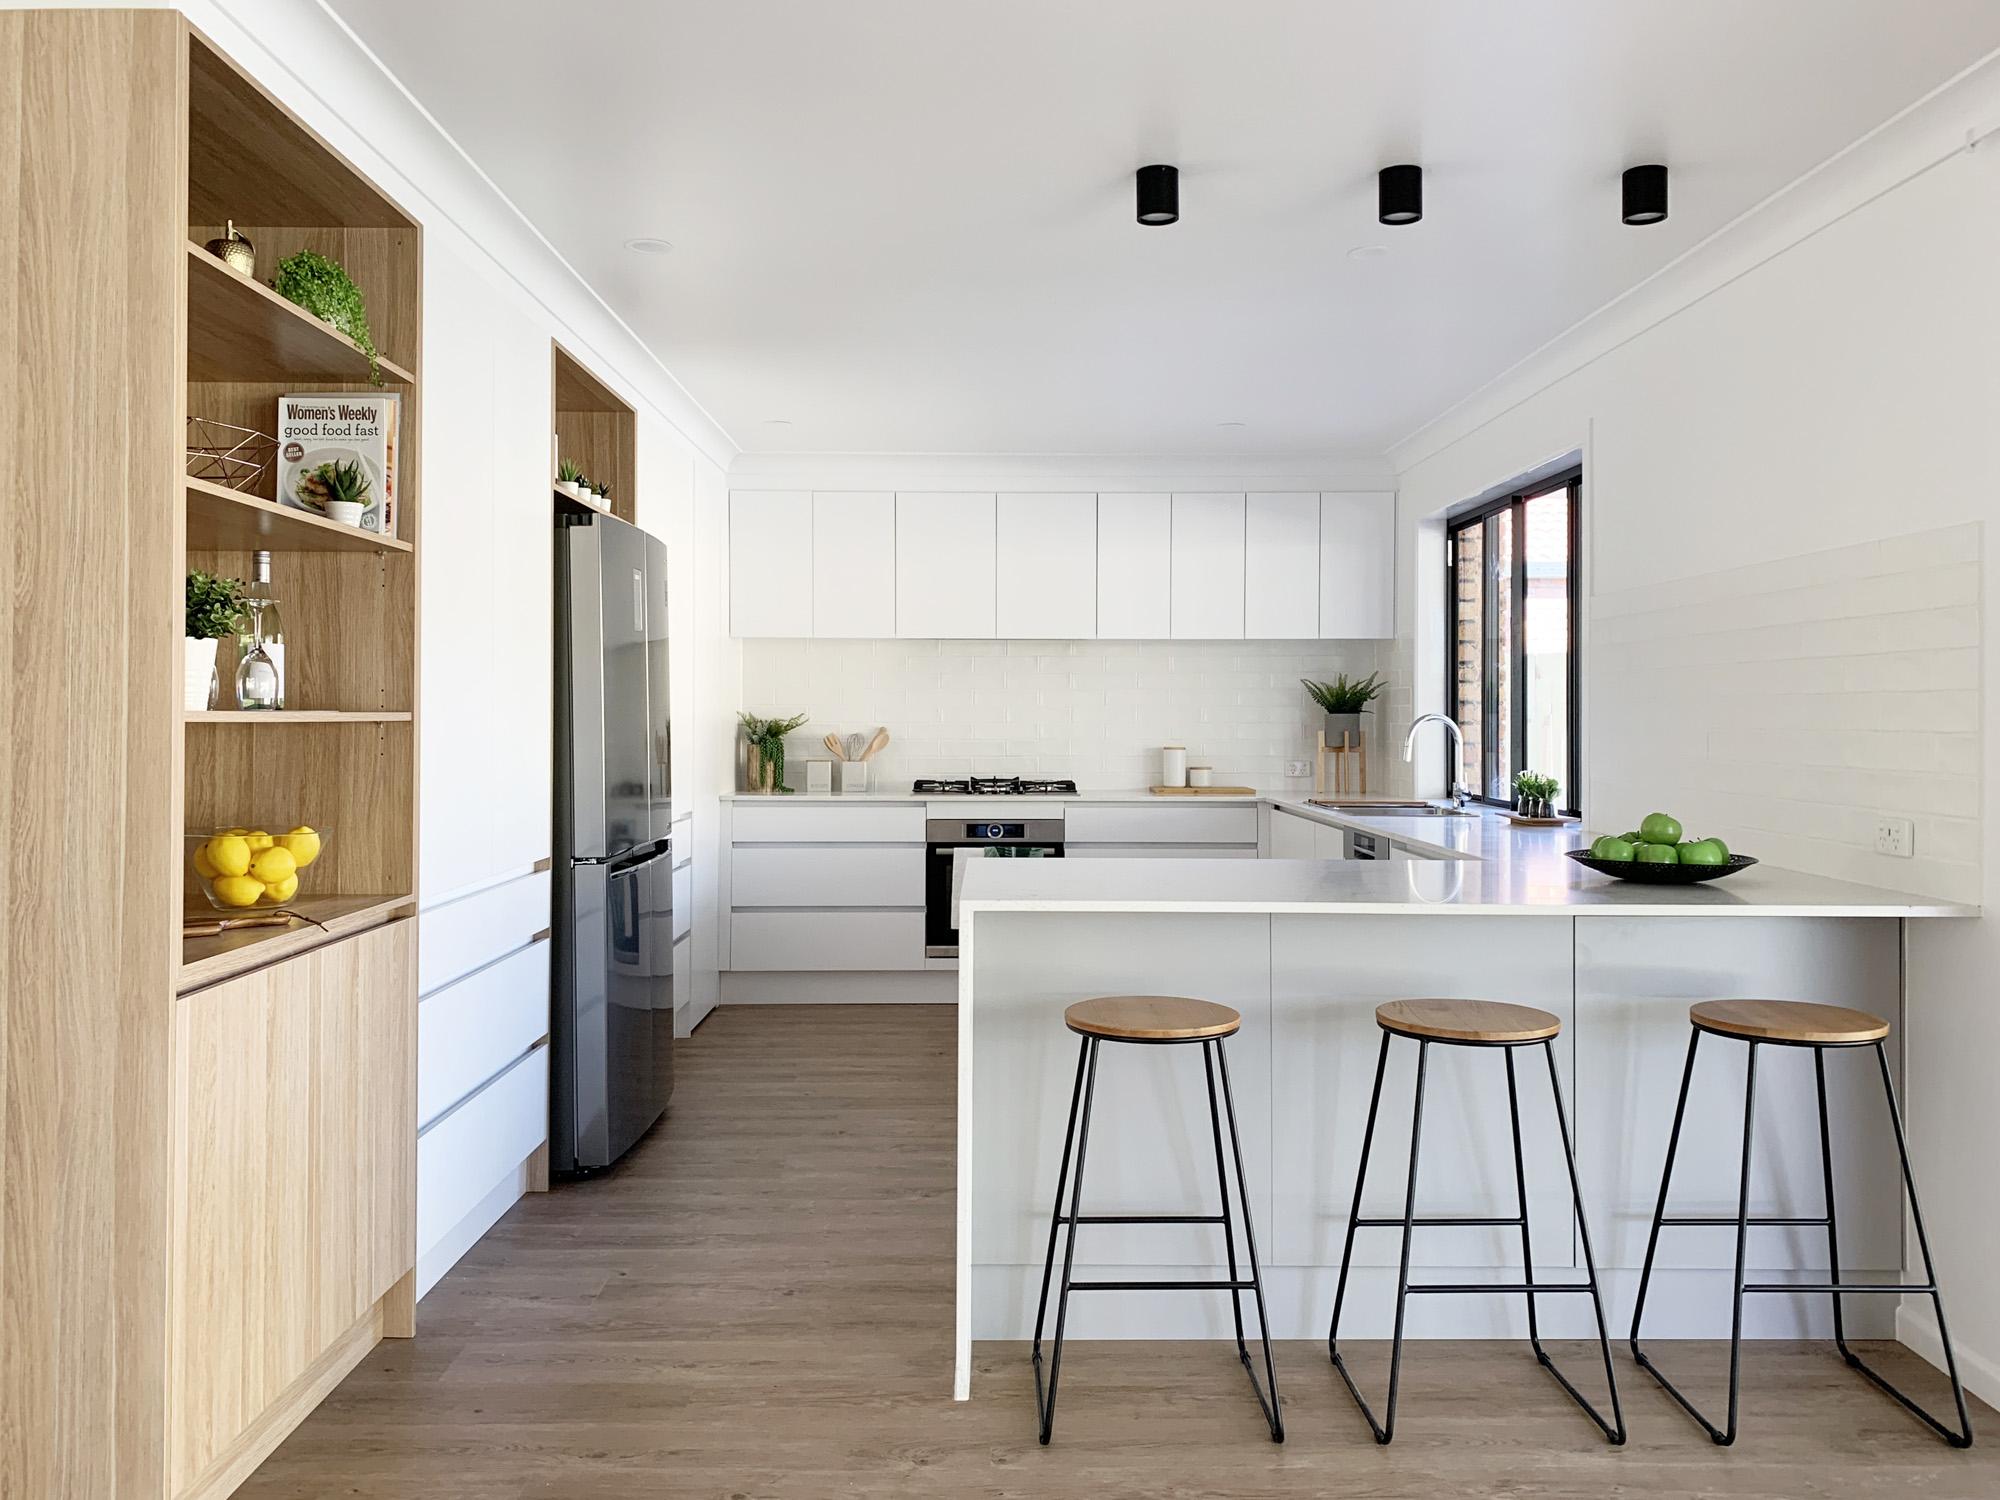 Kitchen Renovations Services Brisbane Kitchens And Bathrooms